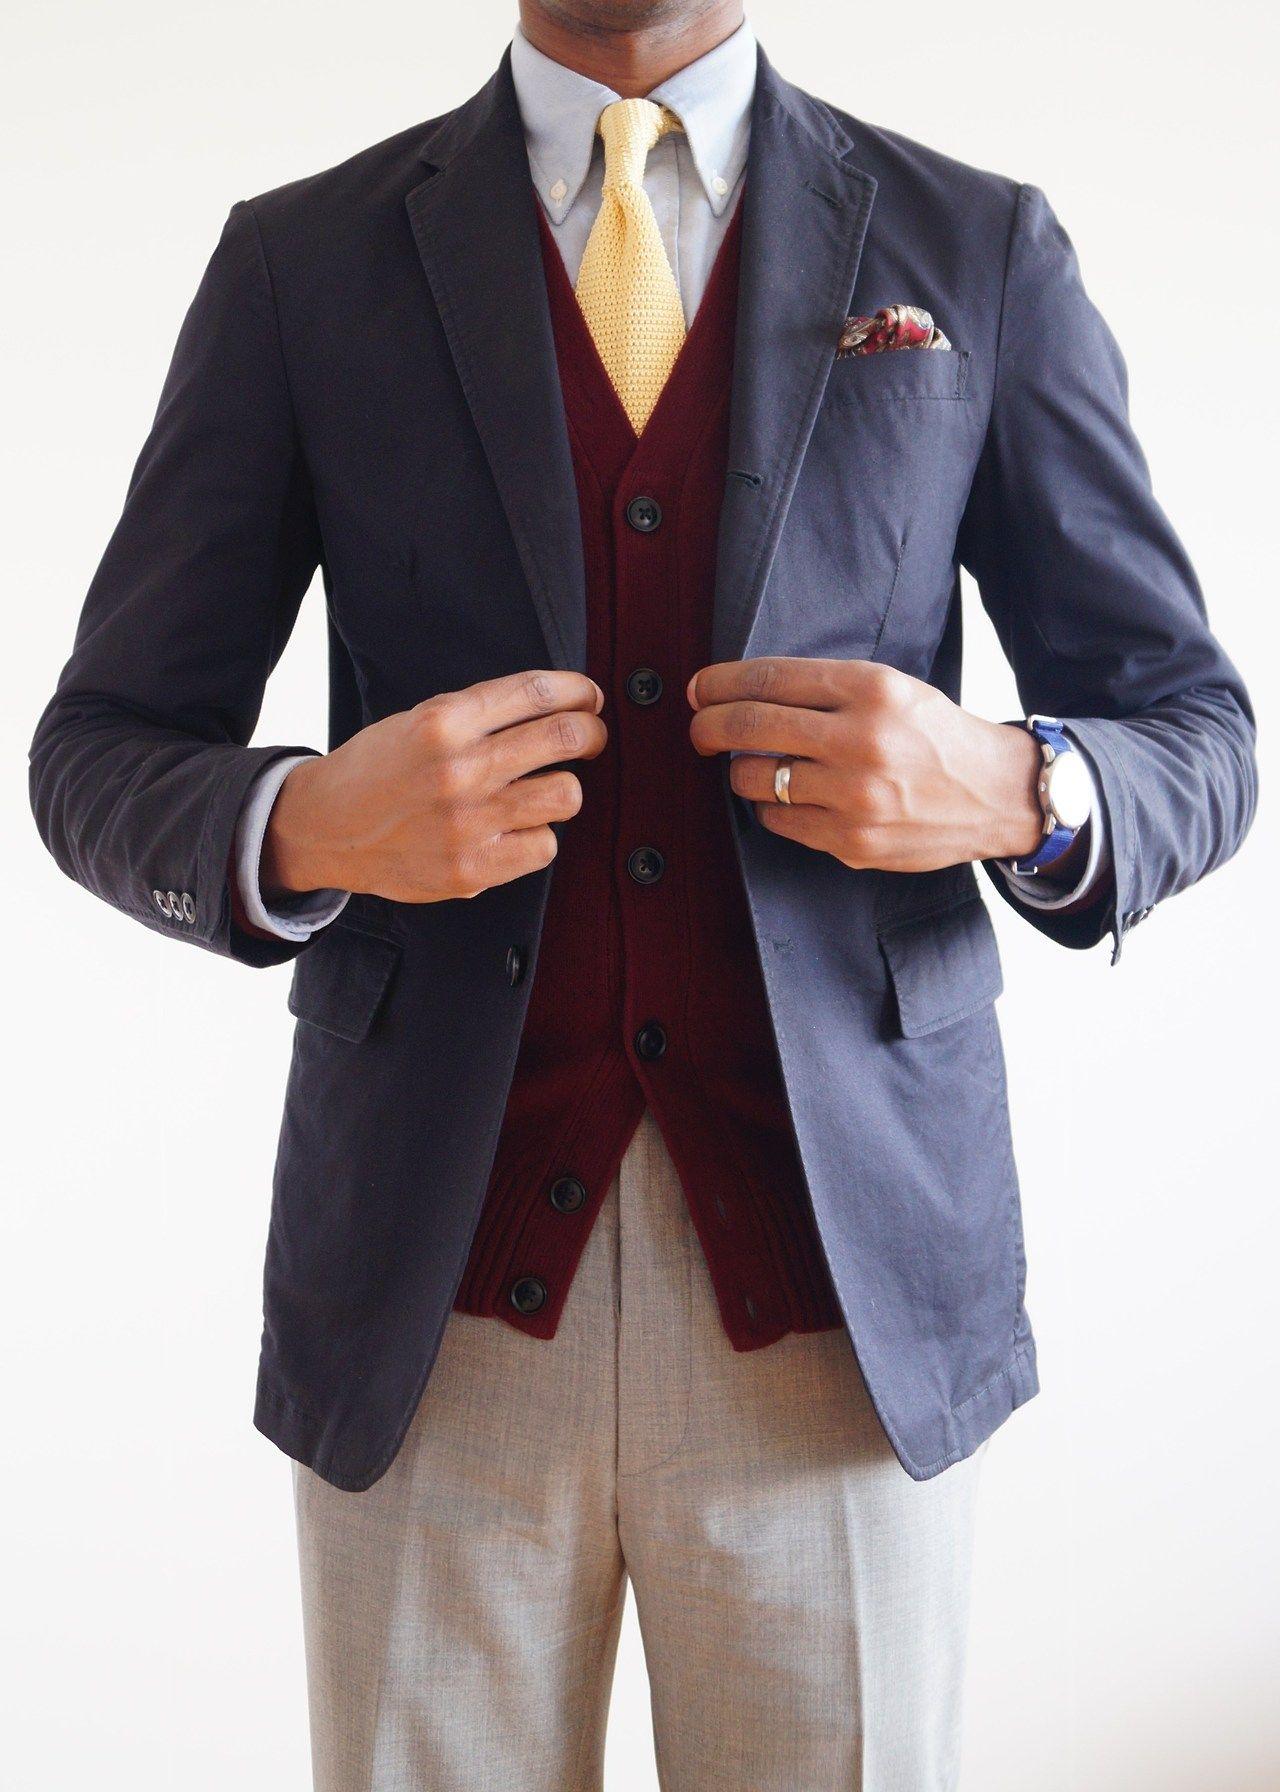 Navy sport coat, light blue OCBD, yellow tie, light grey